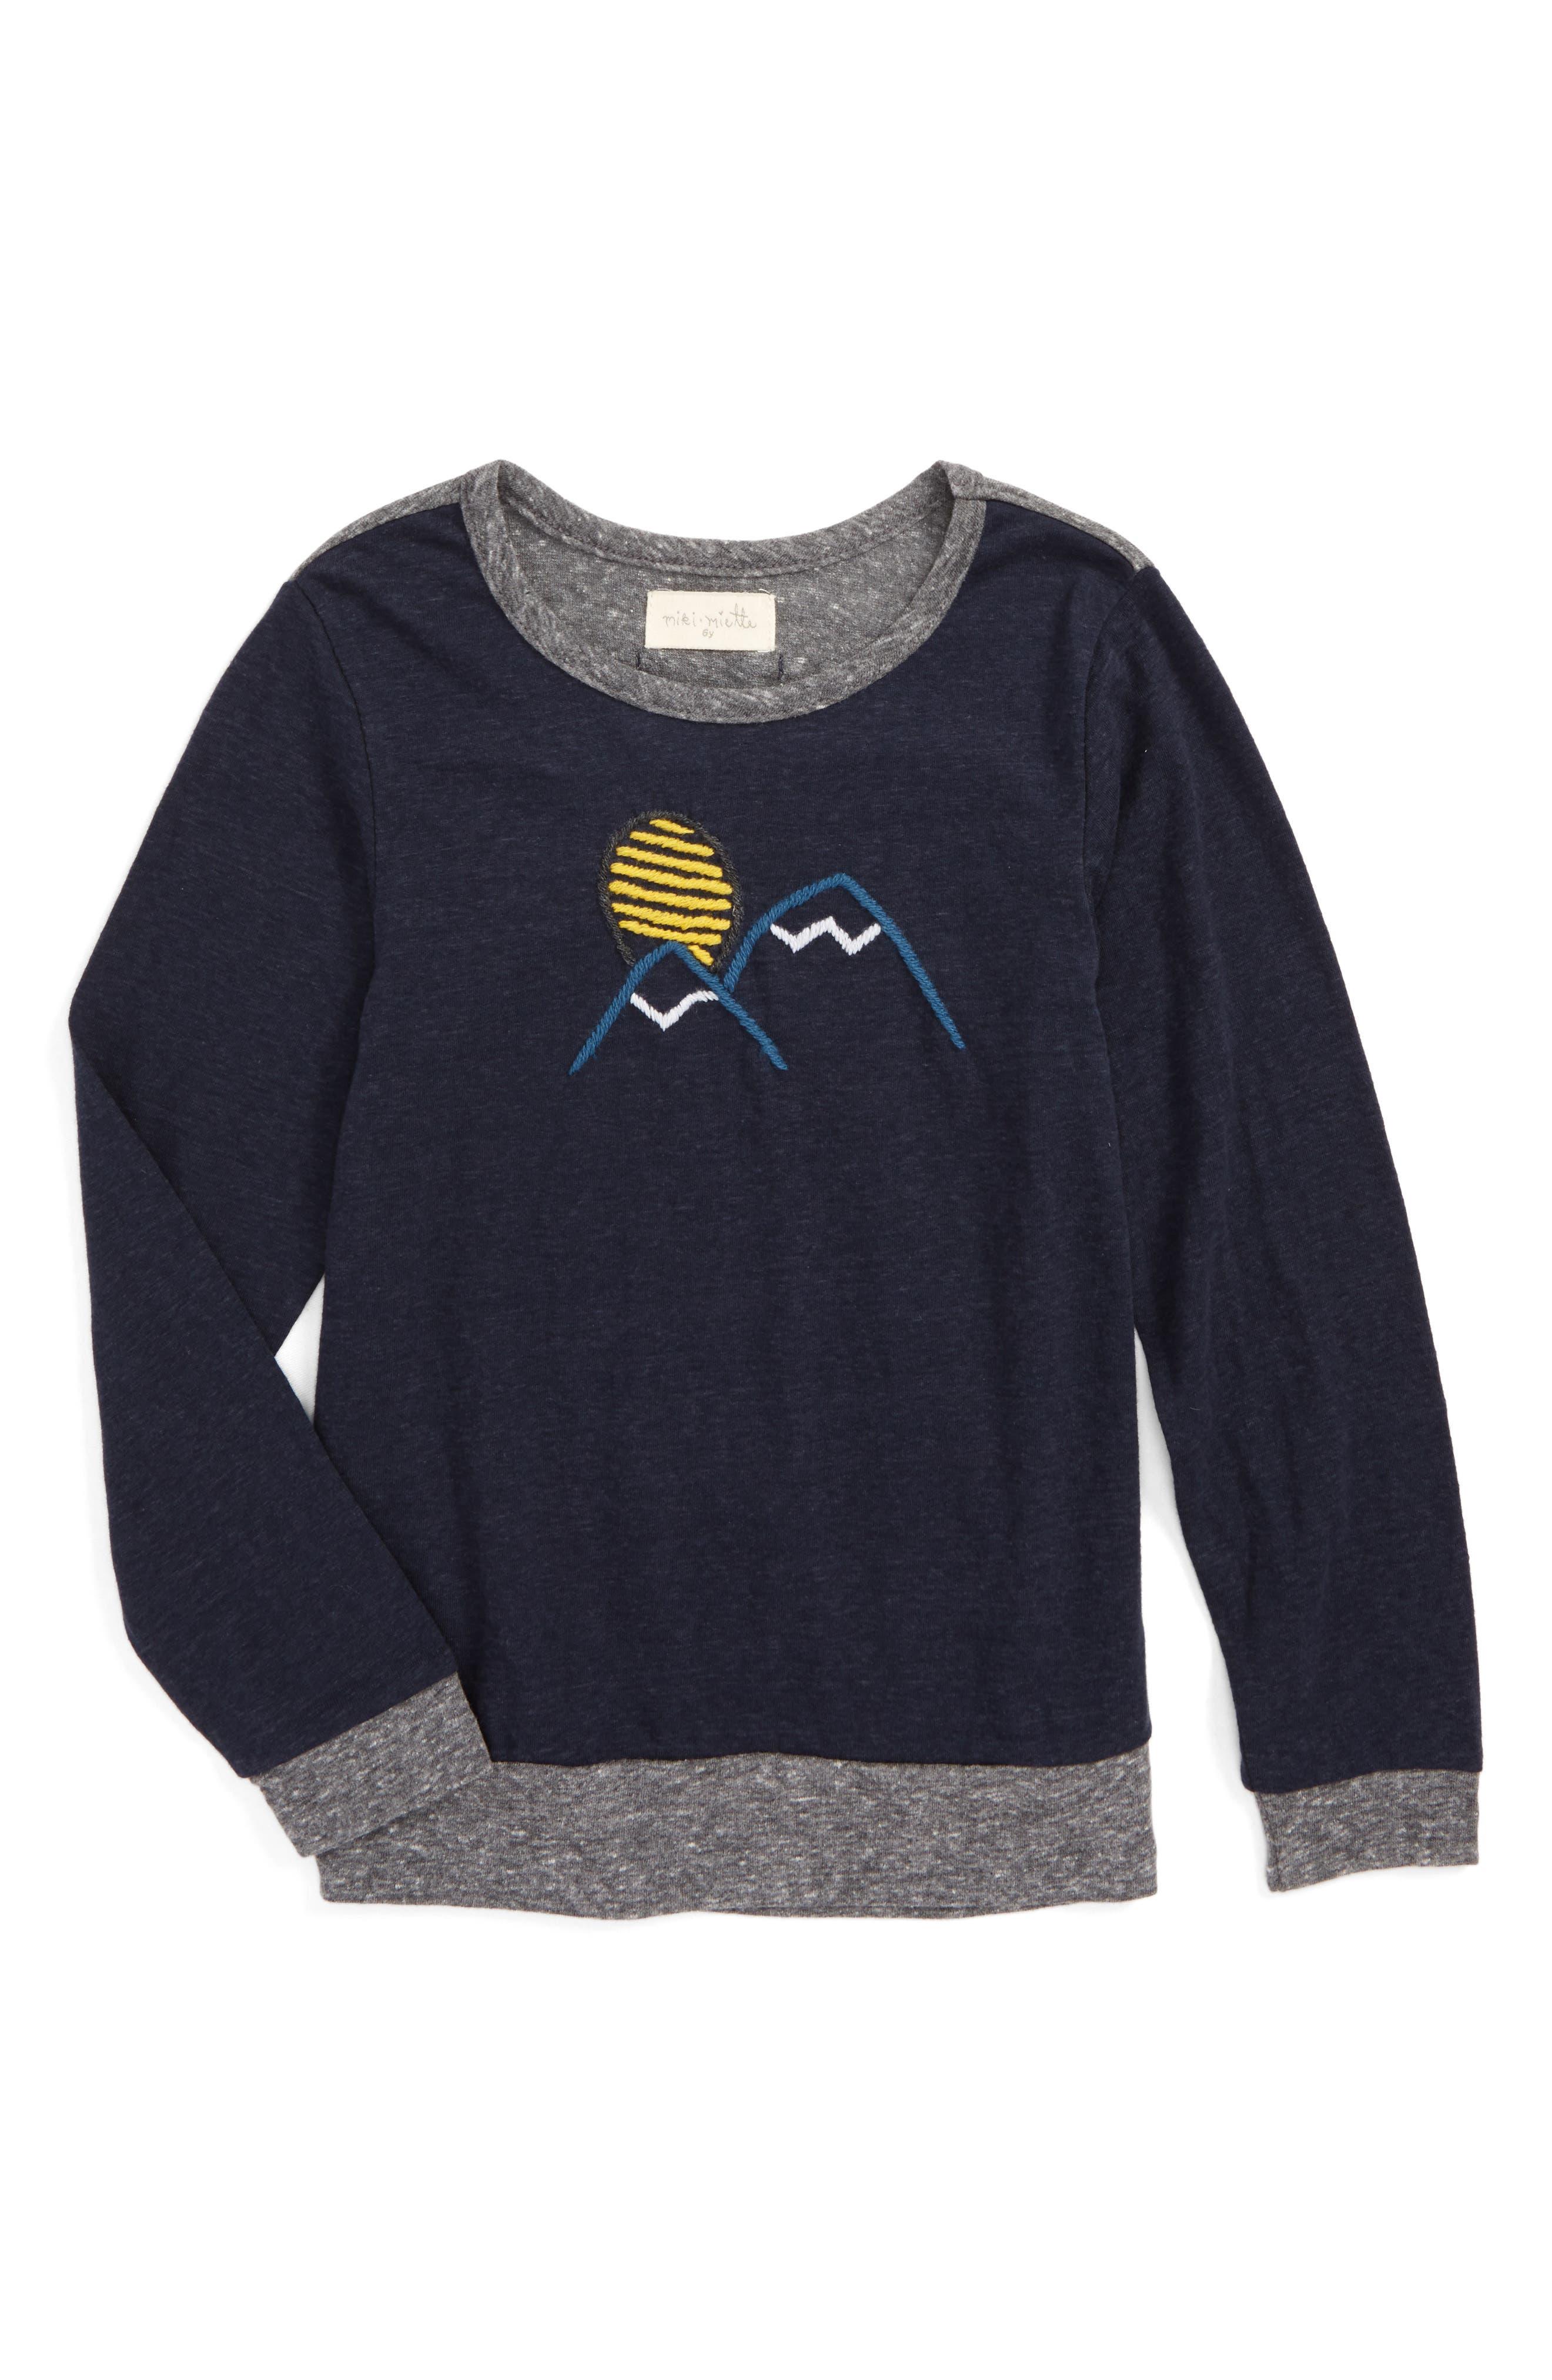 Sam Embroidered T-Shirt,                             Main thumbnail 1, color,                             400